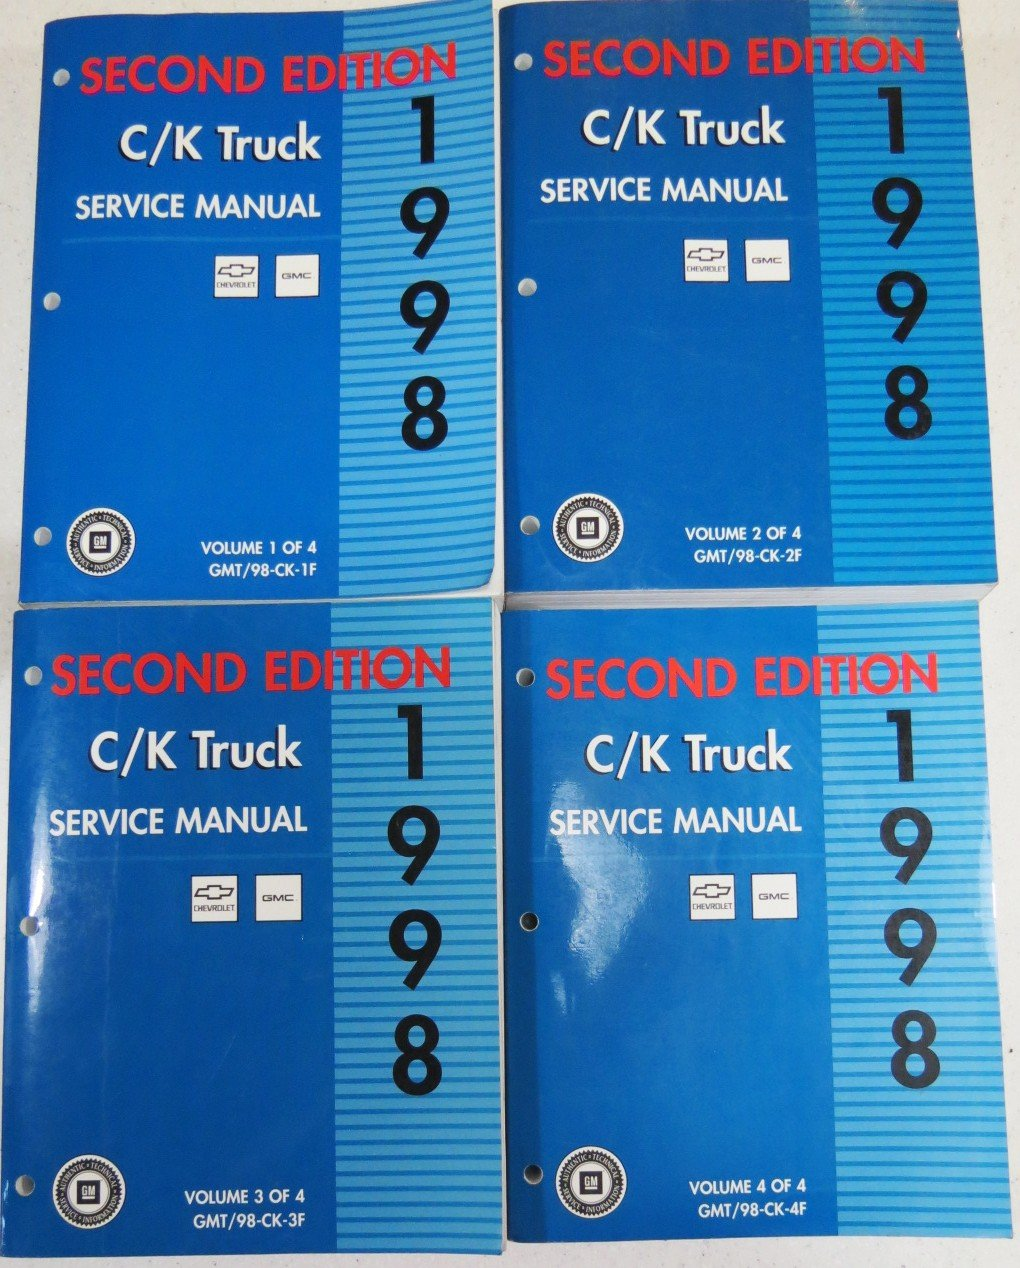 1998 Chevrolet & GMC C/K Truck Service Manuals (Second Edition; 4 Vol. Set)  GMT/98-CK-1F: General Motors Corporation: Amazon.com: Books